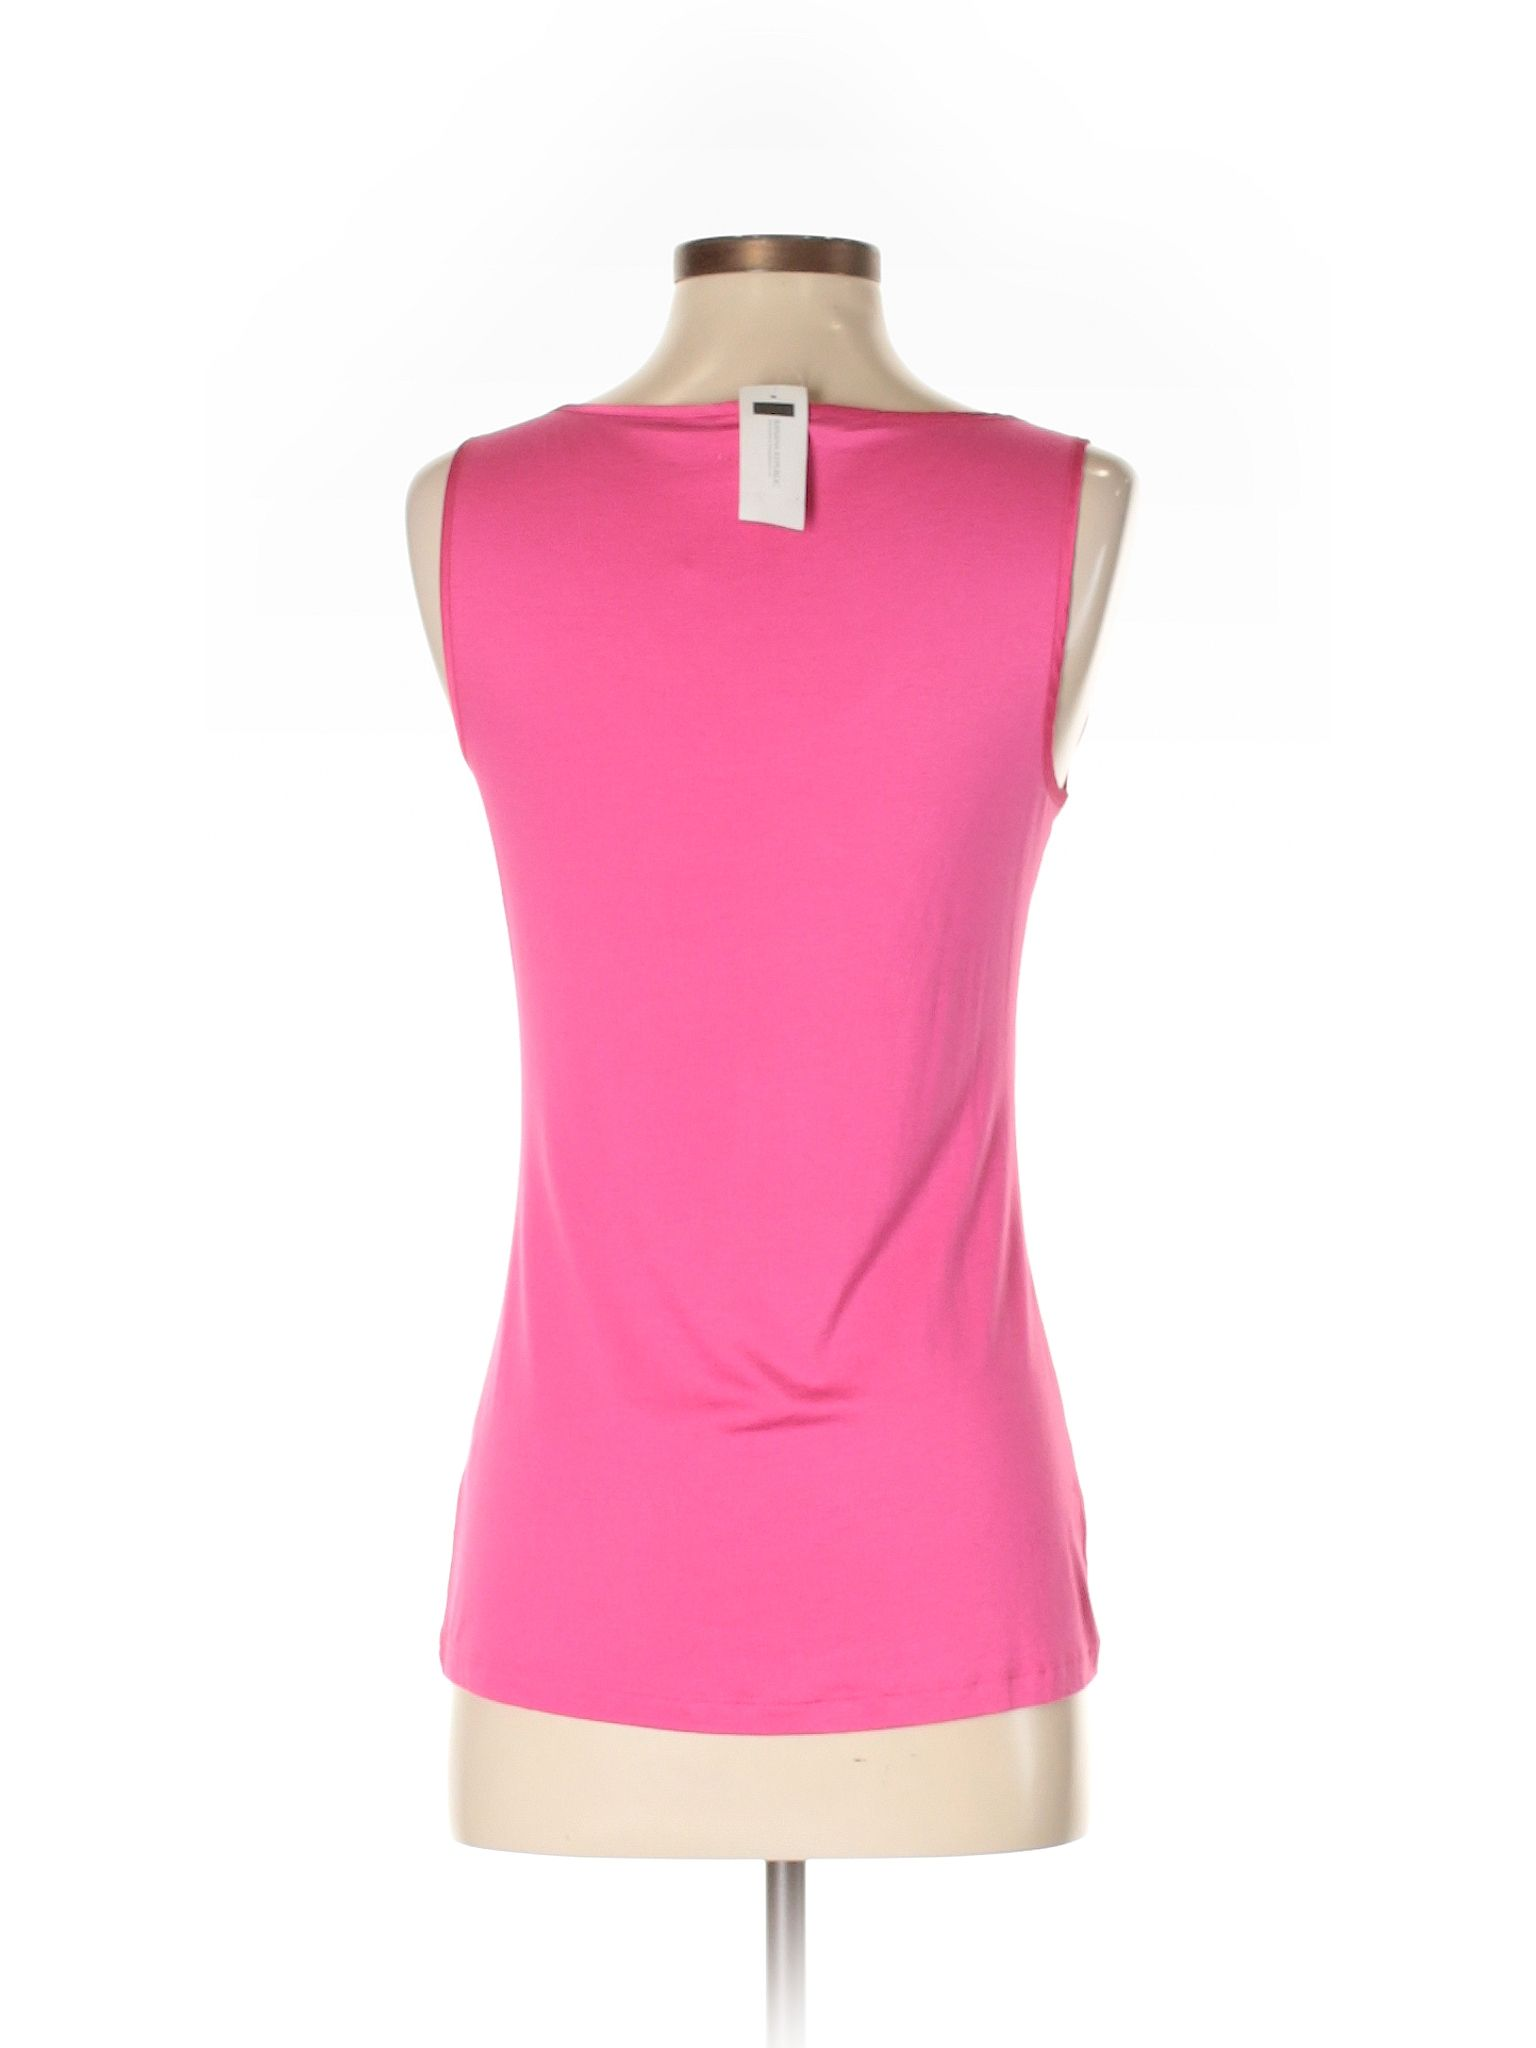 Banana Republic Tank Top Size 400 Pink Womens Tops